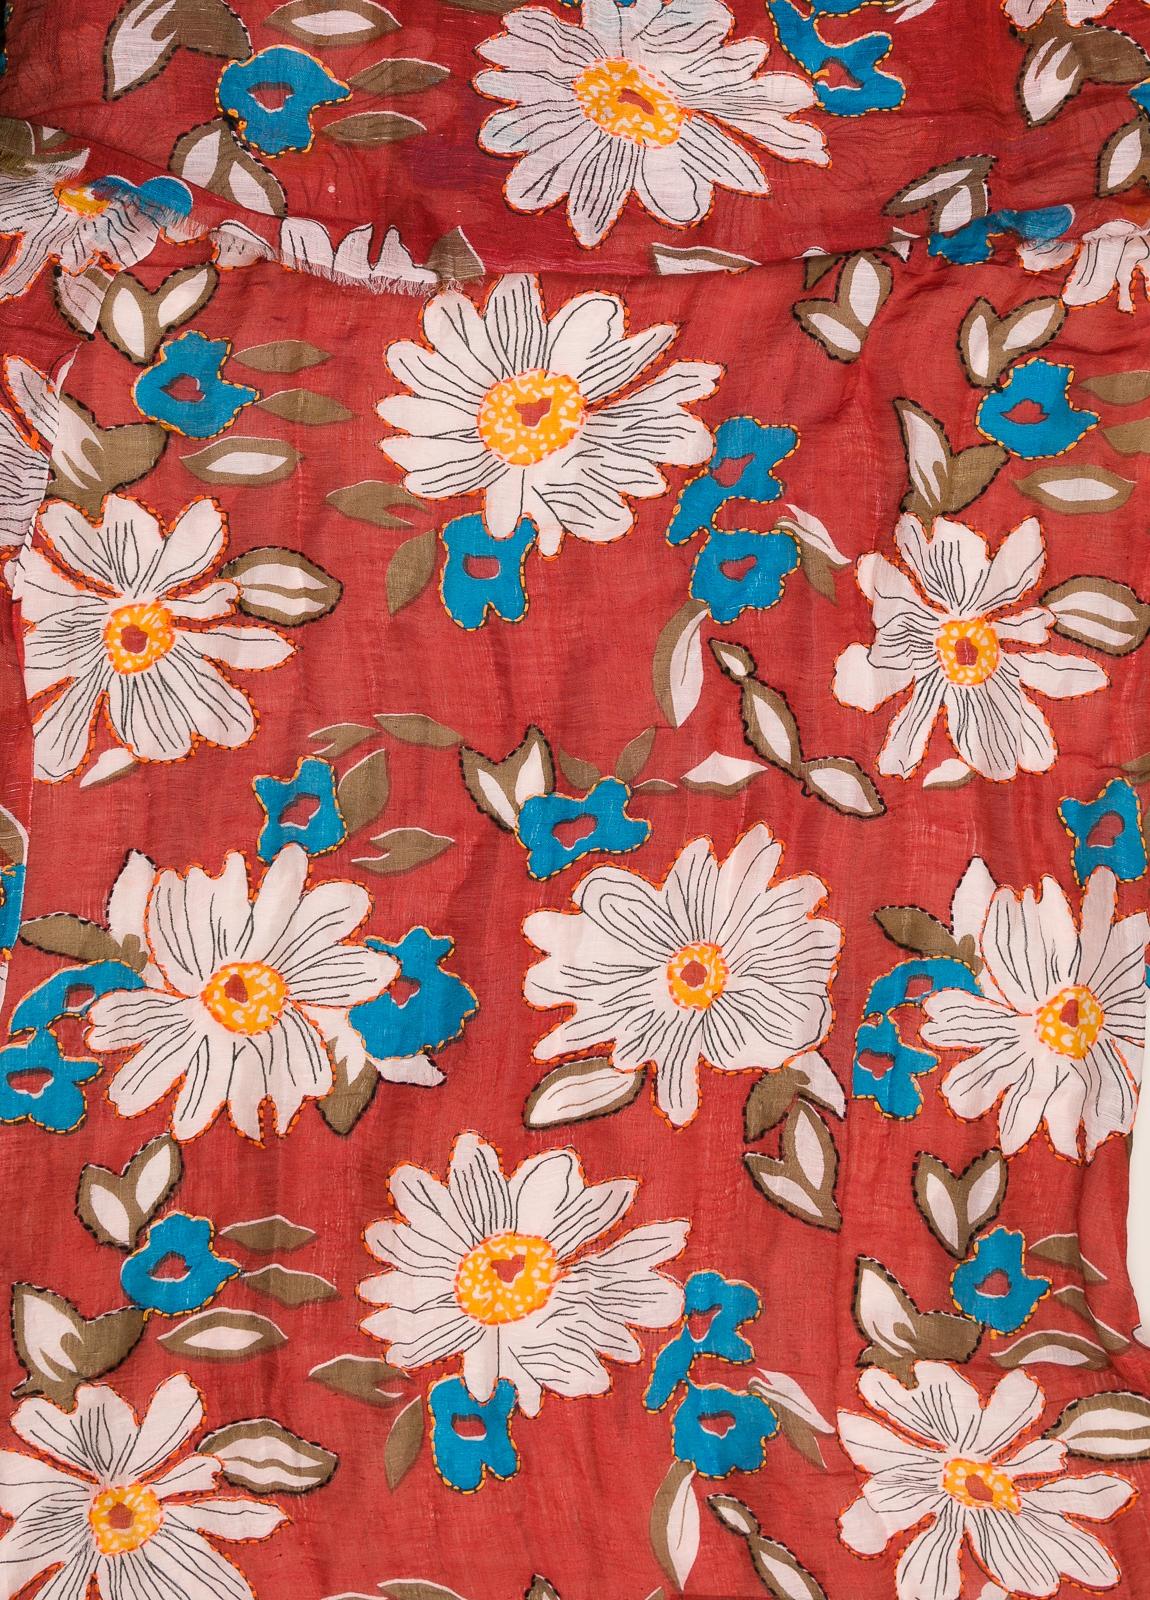 Foulard CAMERUCCI estampado flores - Ítem1